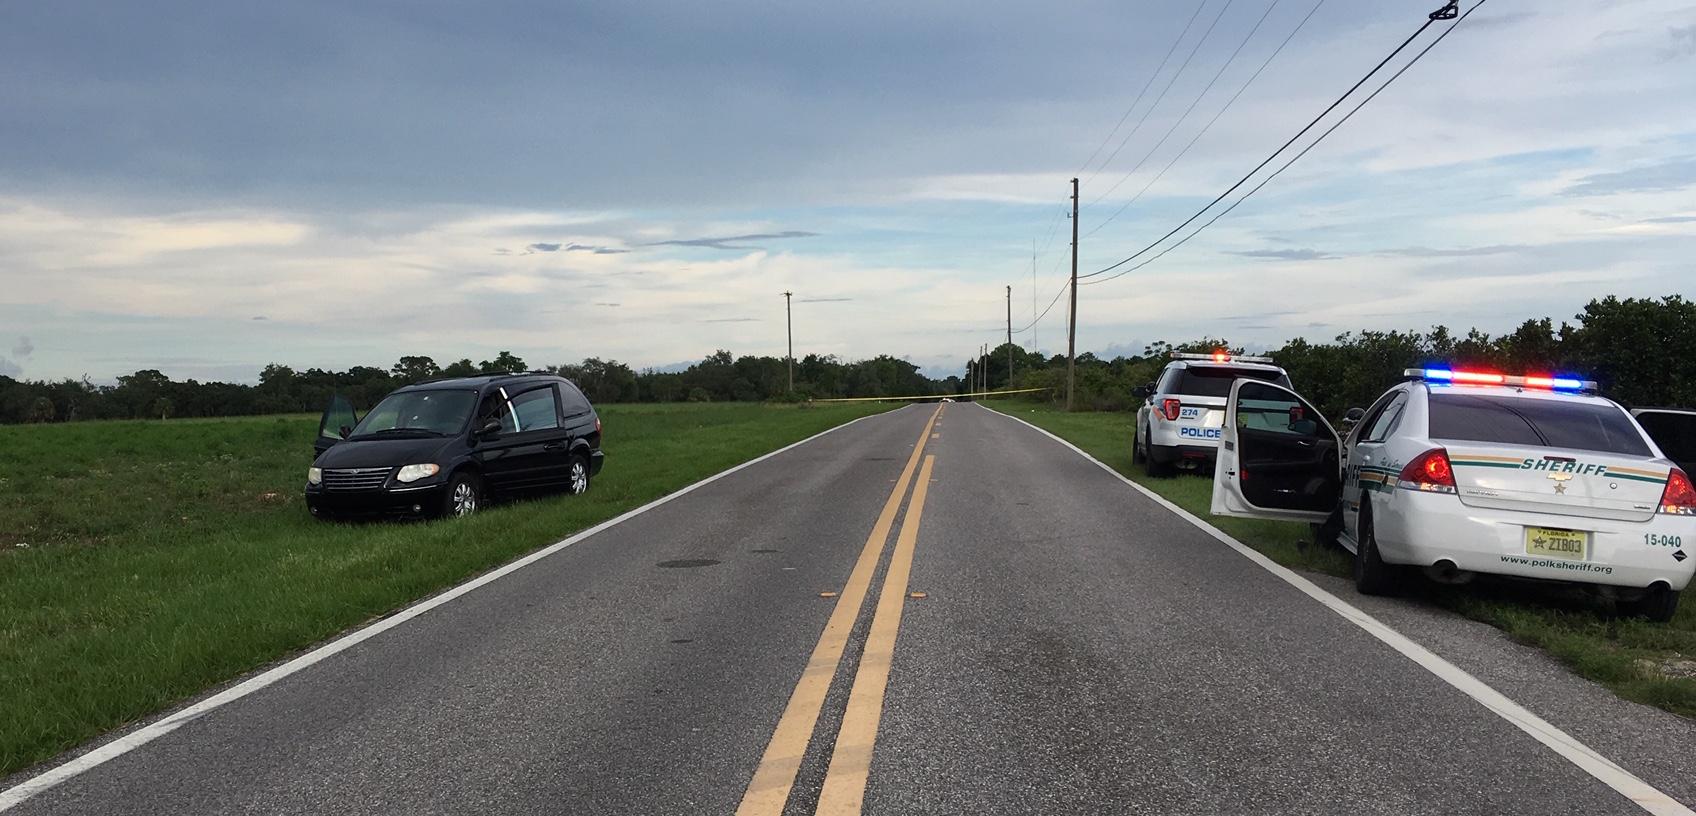 Carl Boozer Road scene